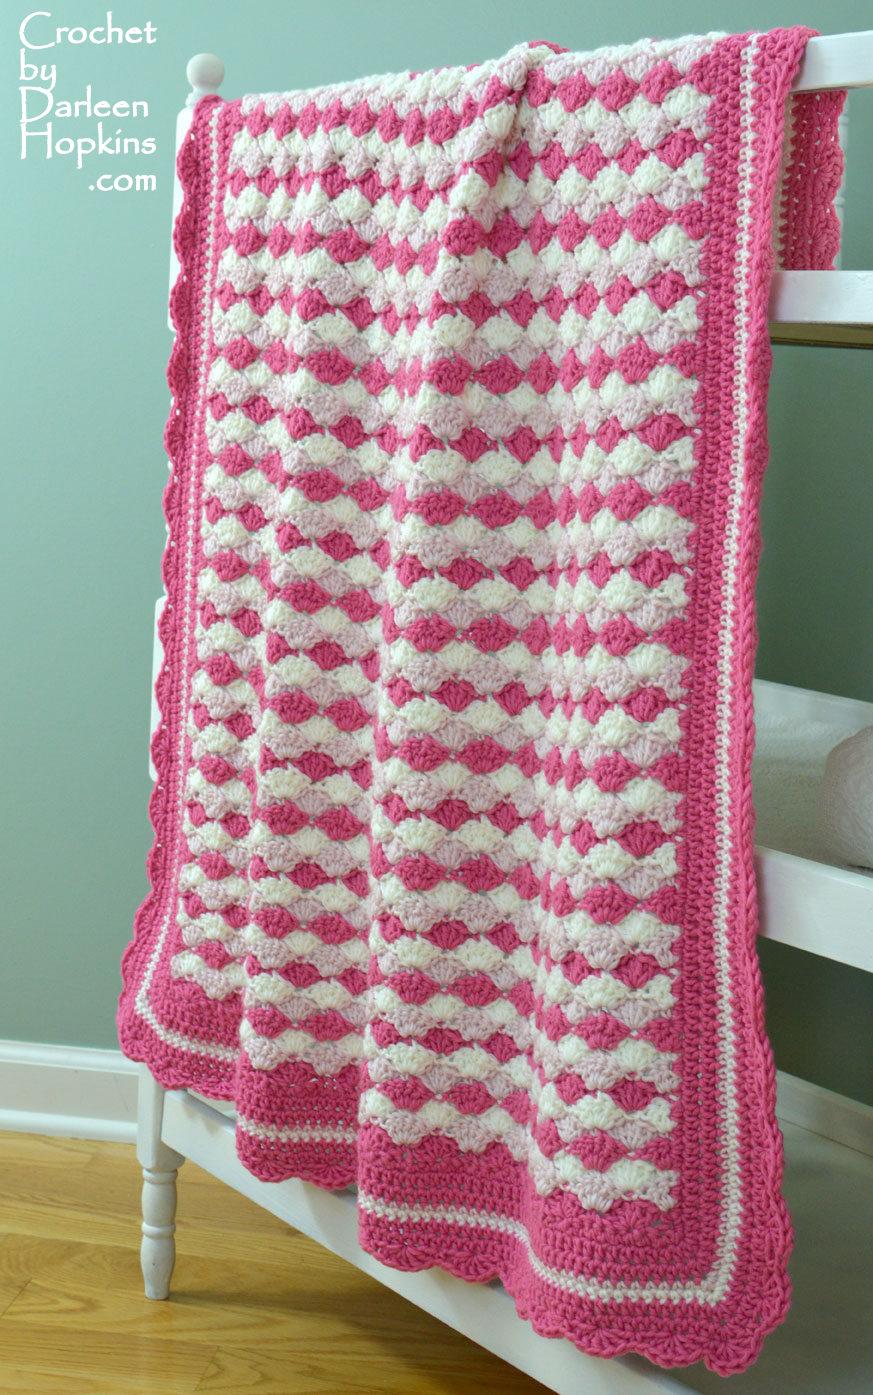 Shells Of Love Crochet Baby Blanket Pattern : Baby Blanket-Shells of Love Crochet By Darleen Hopkins